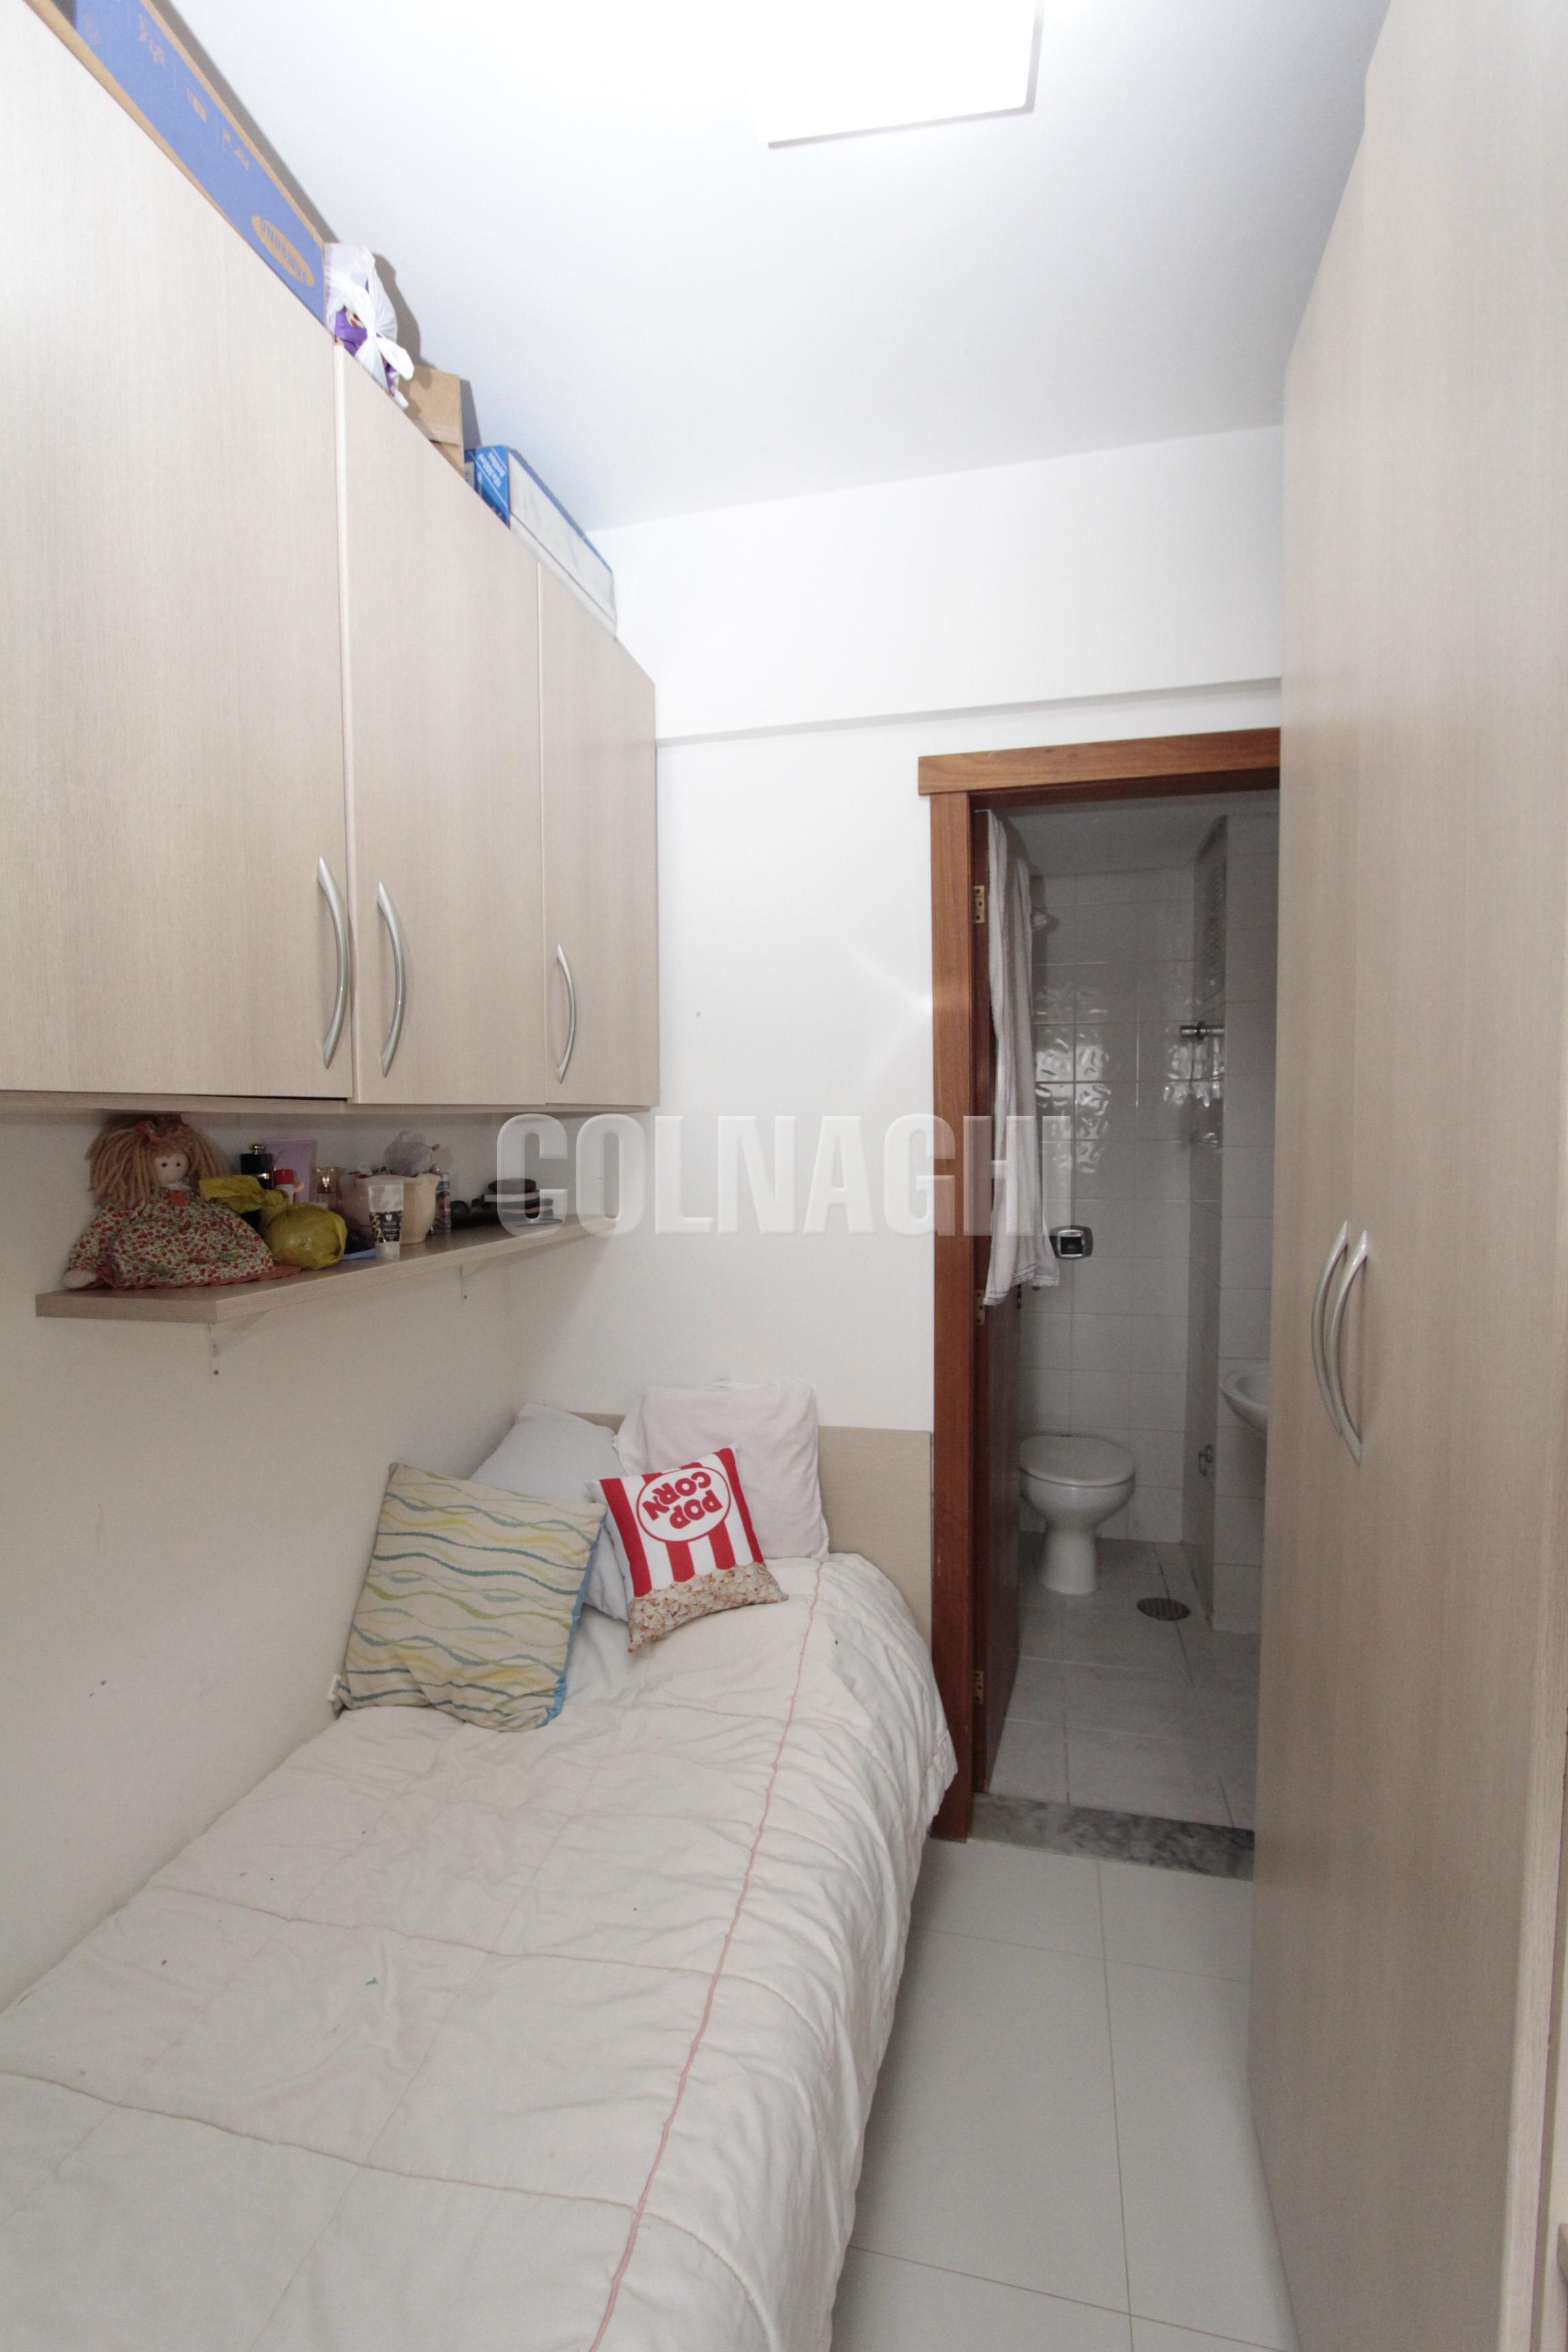 Piaza Nobili - Apto 3 Dorm, Bela Vista, Porto Alegre (CL1328) - Foto 19